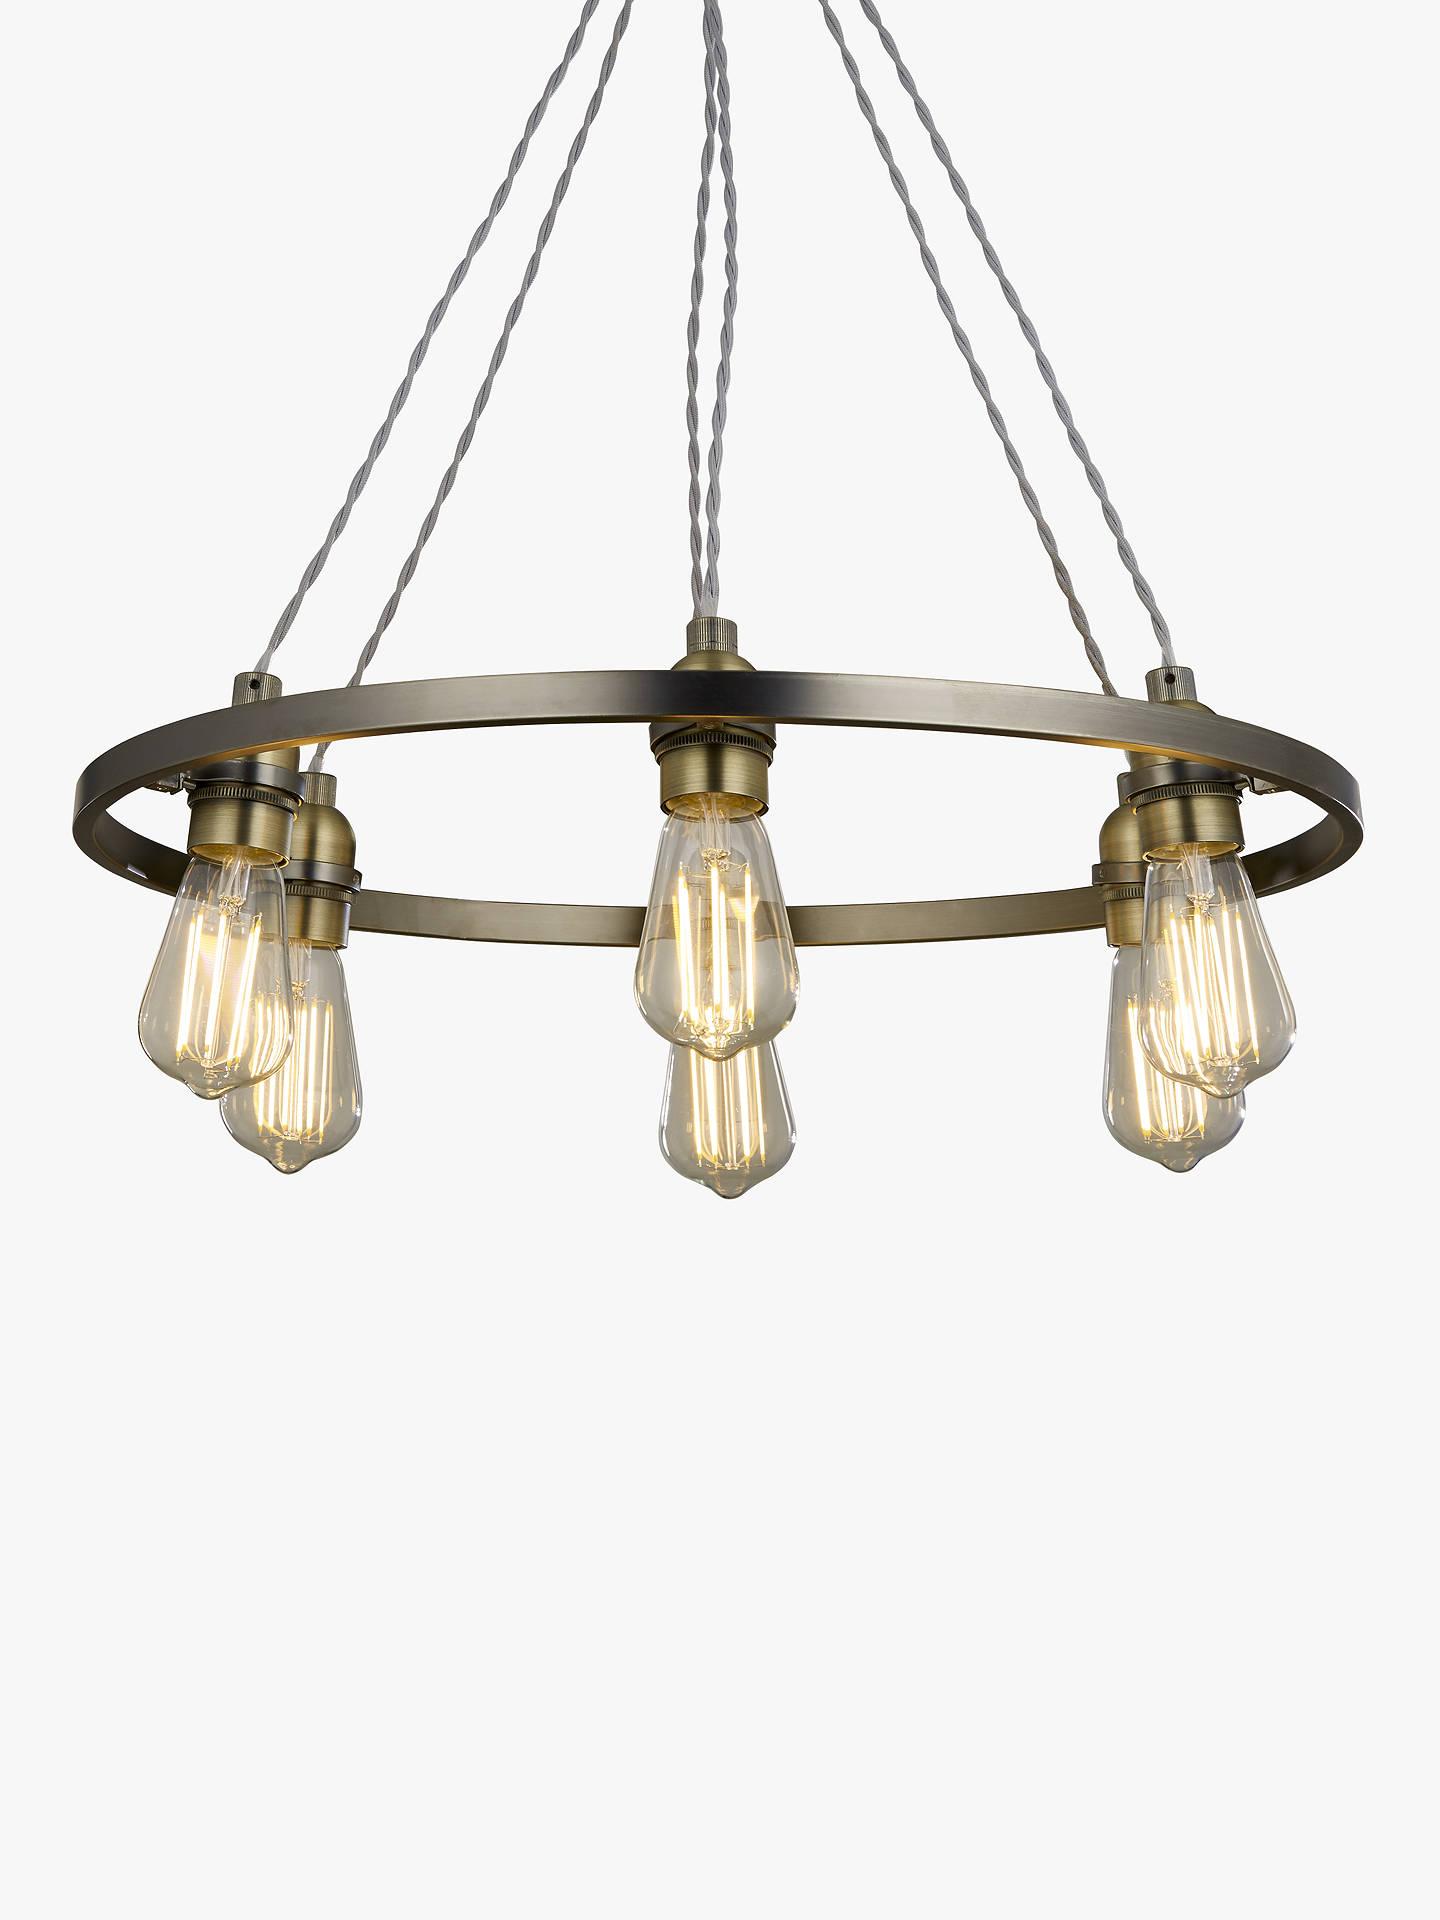 best authentic 6424e 46e89 John Lewis & Partners Bistro Hoop Pendant Ceiling Light, 6 Light, Pewter